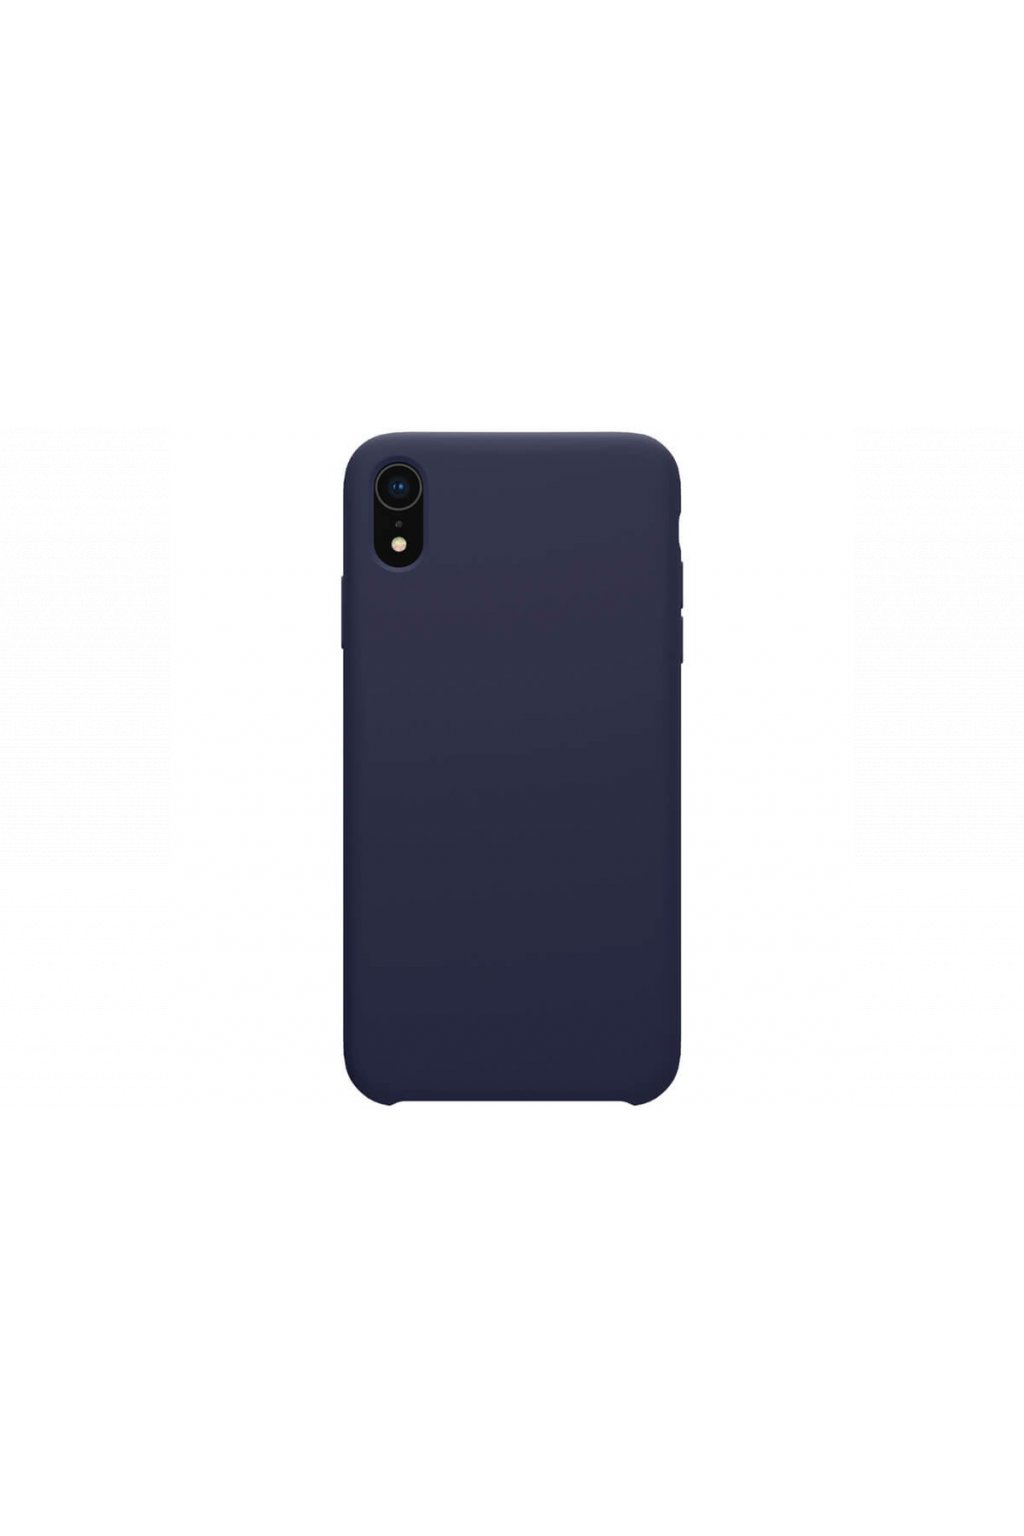 2189 silikonovy kryt pro iphone xr modry